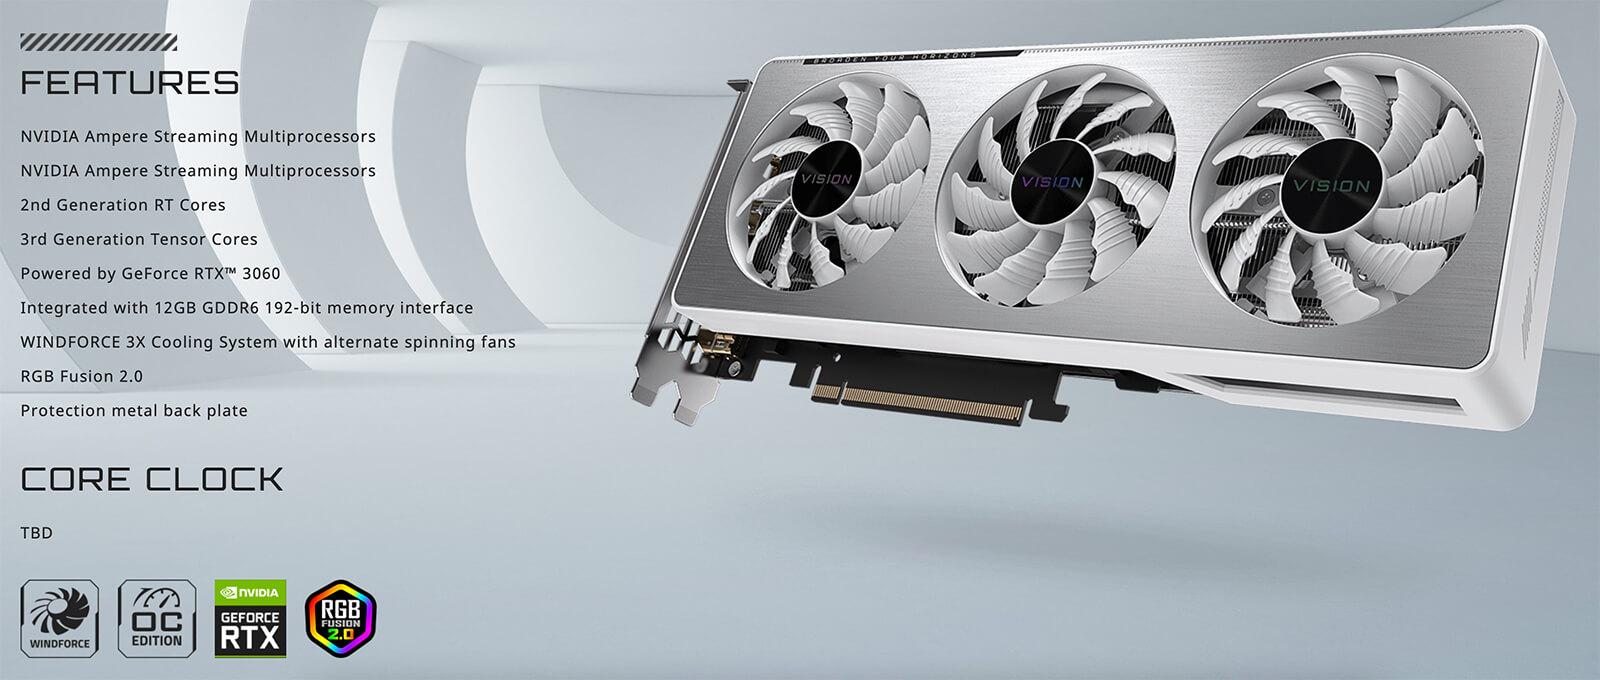 Gigabyte Geforce Rtx™ 3060 Vision Oc 12g Features